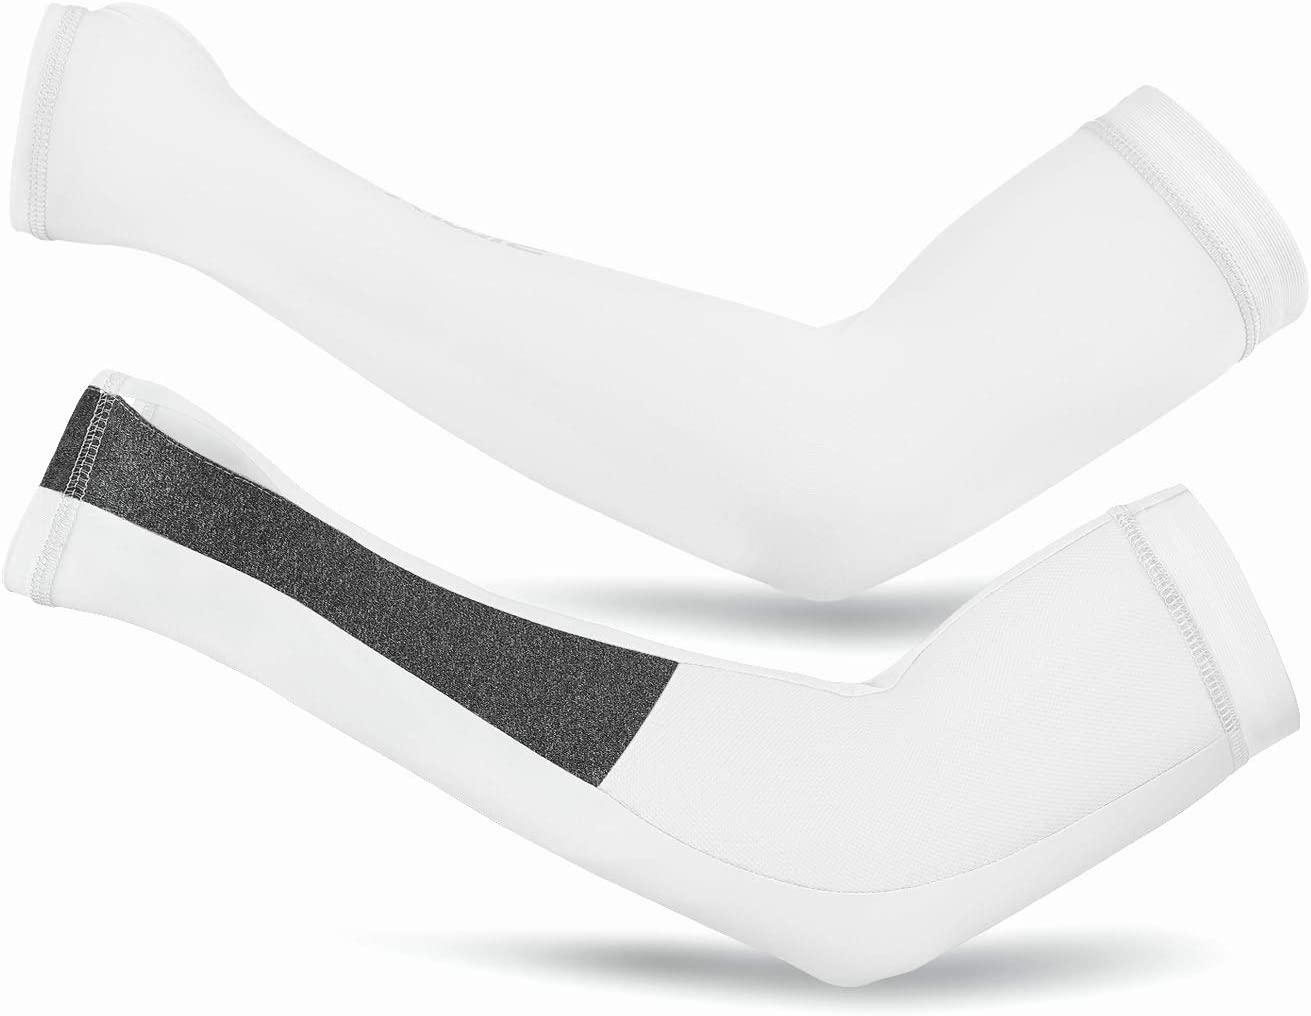 Vagasi Manchettes de Bras Protection UV UPF 50 Unisex Compression Manches Soie Glac/é Ultra Elastique pour Fitness Cyclism Basketball Course